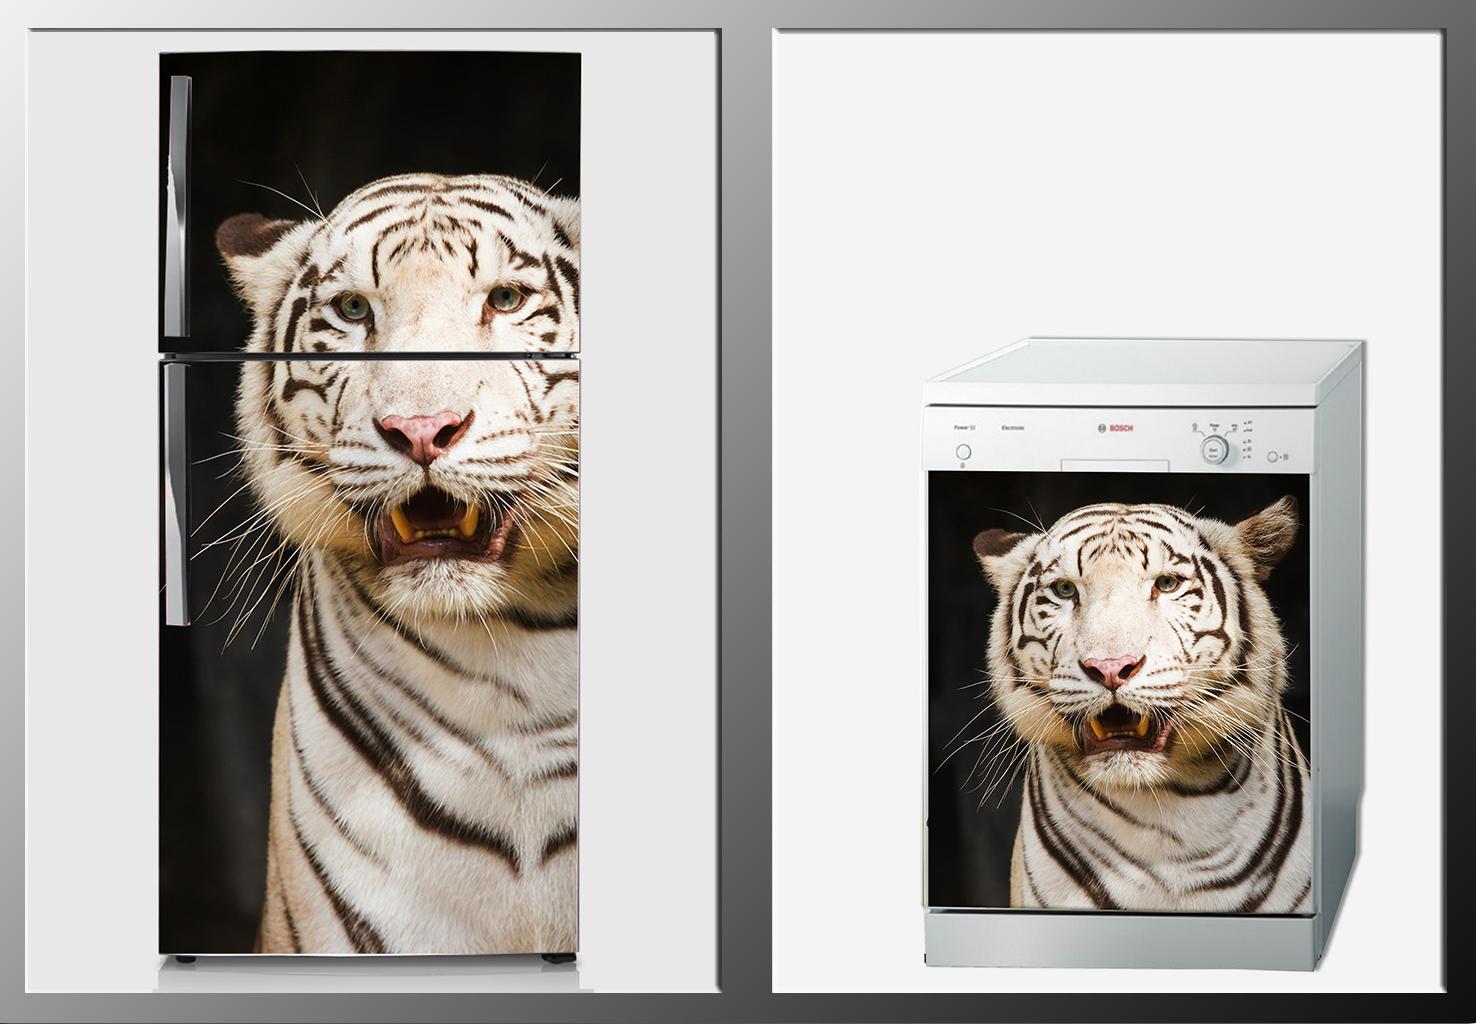 ArtWall Beyaz Eşya Hayvan Sticker